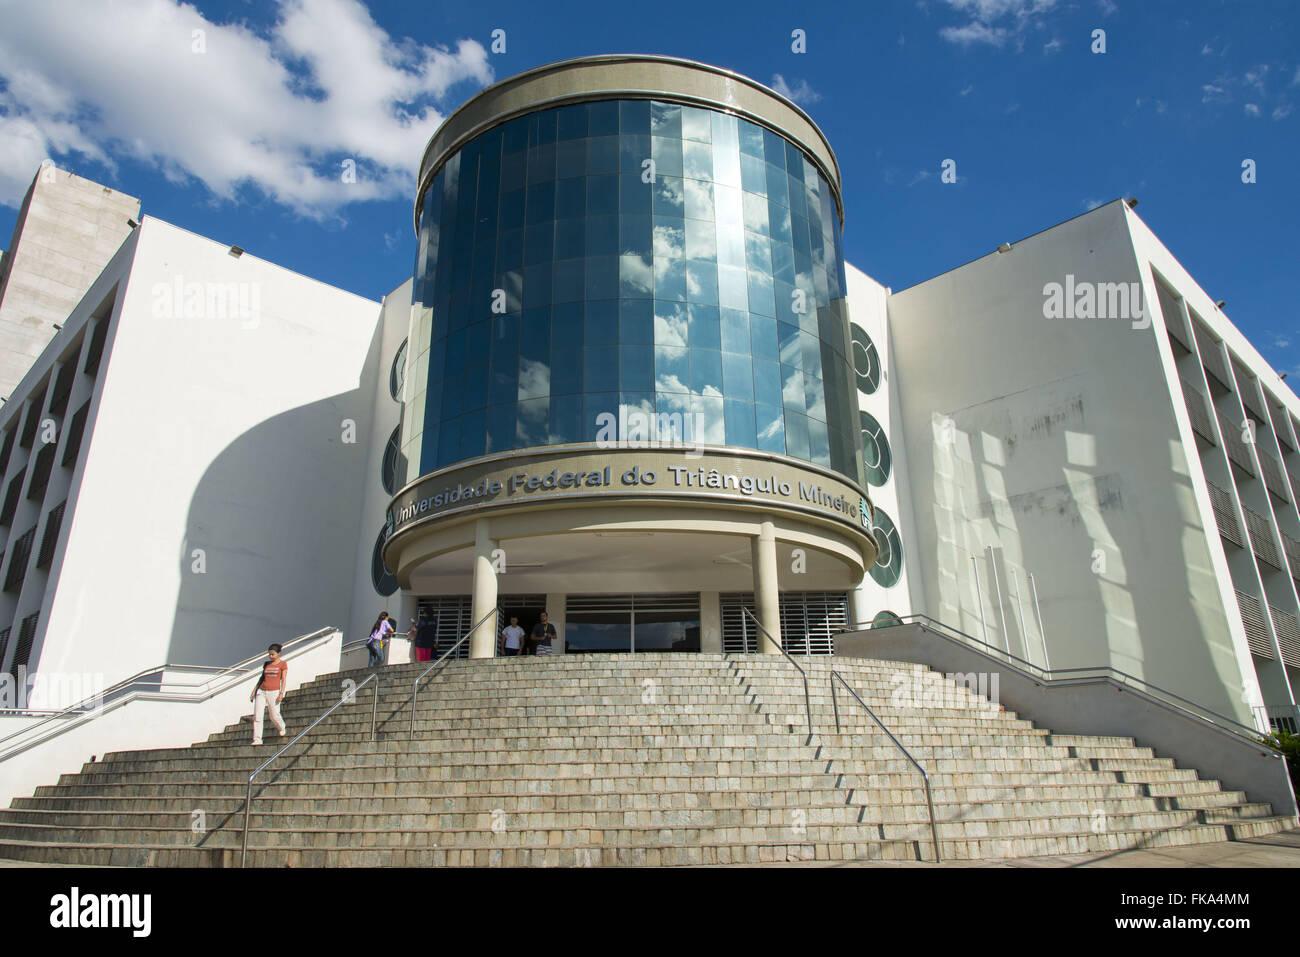 Federal University of Triangulo Mineiro - the UFTM Educational Center Stock Photo